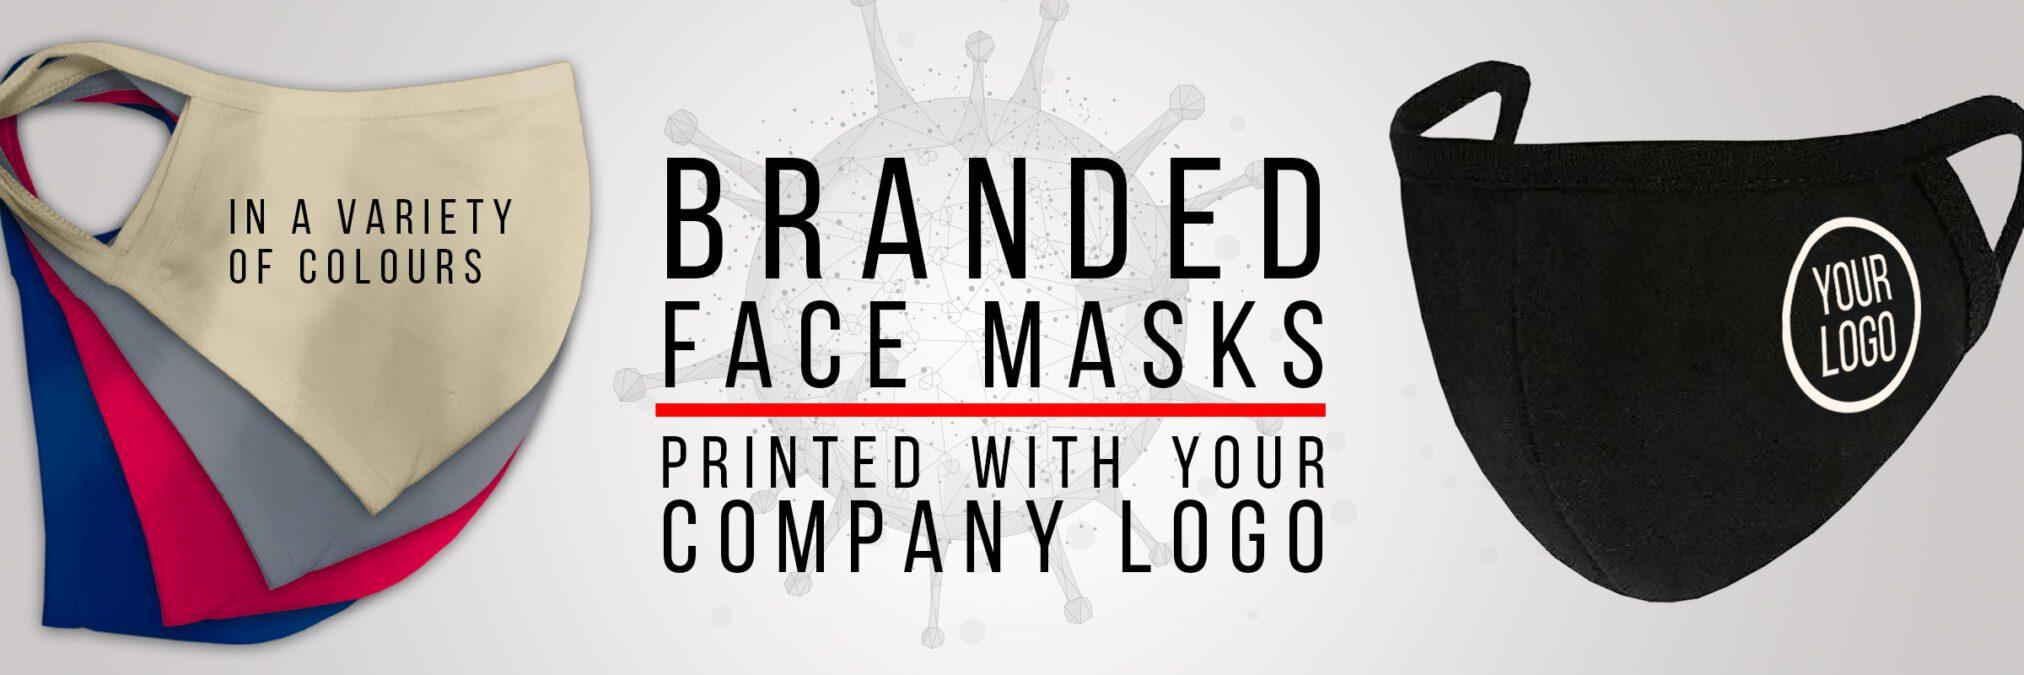 COVID 19 - Branded Face Masks